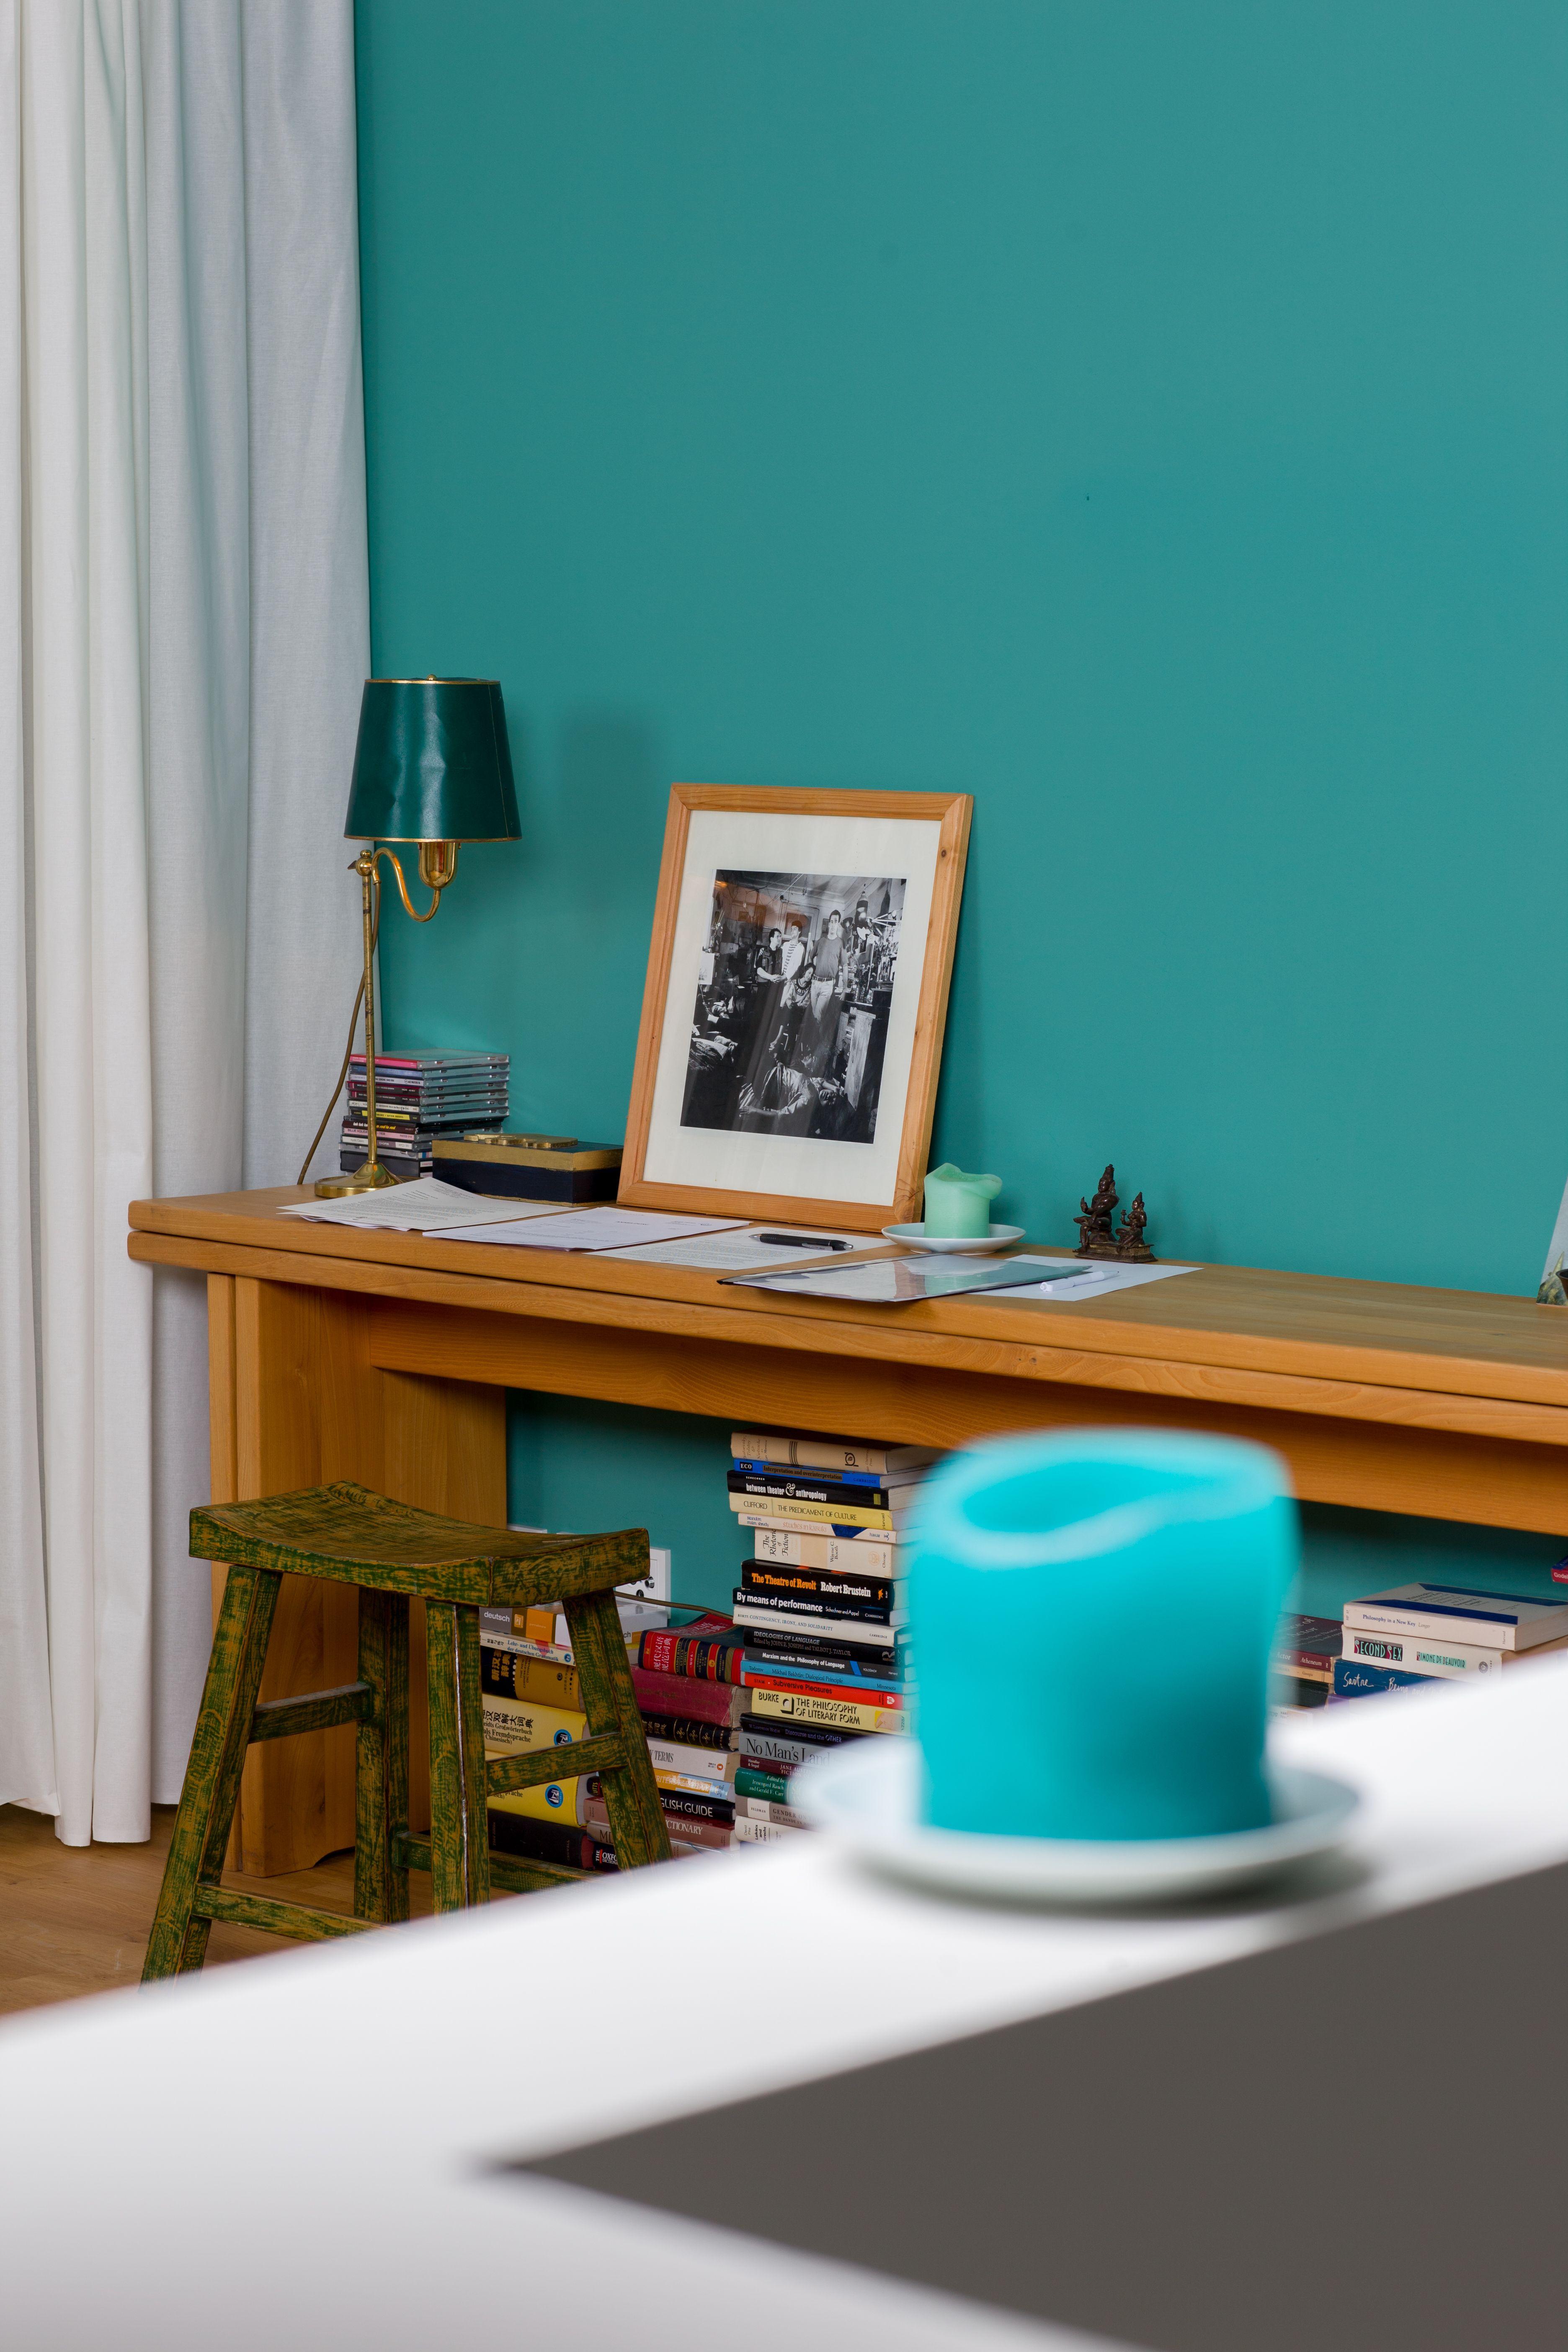 Esmeralda 050 In 2020 Grune Wand Farben Wand